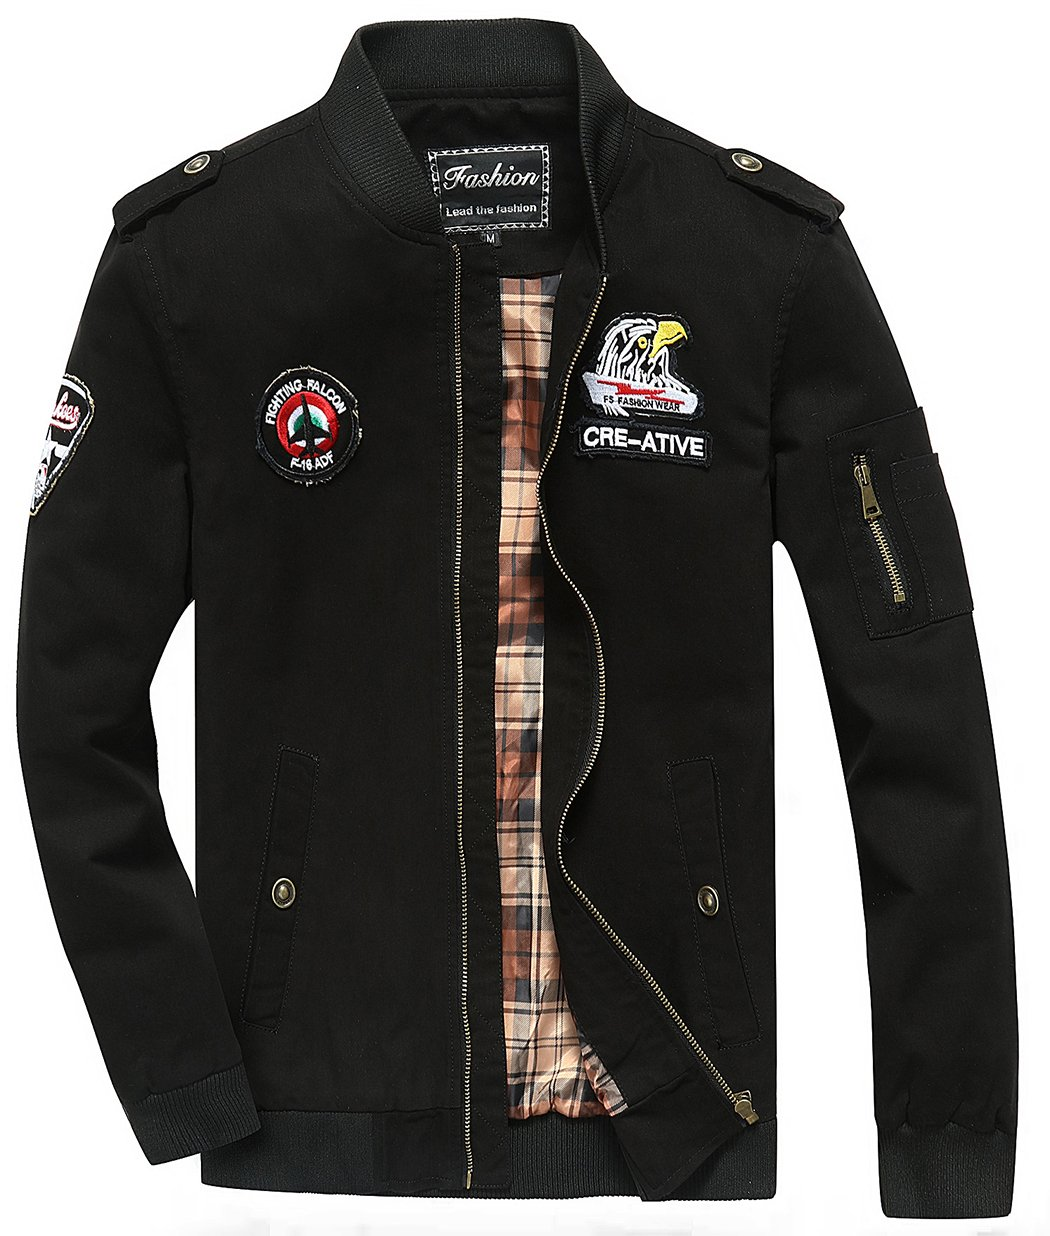 Sawadikaa Men's Military Cotton Lightweight Jacket Windbreaker Wind Trench Coat Bomber Jacket Black Large